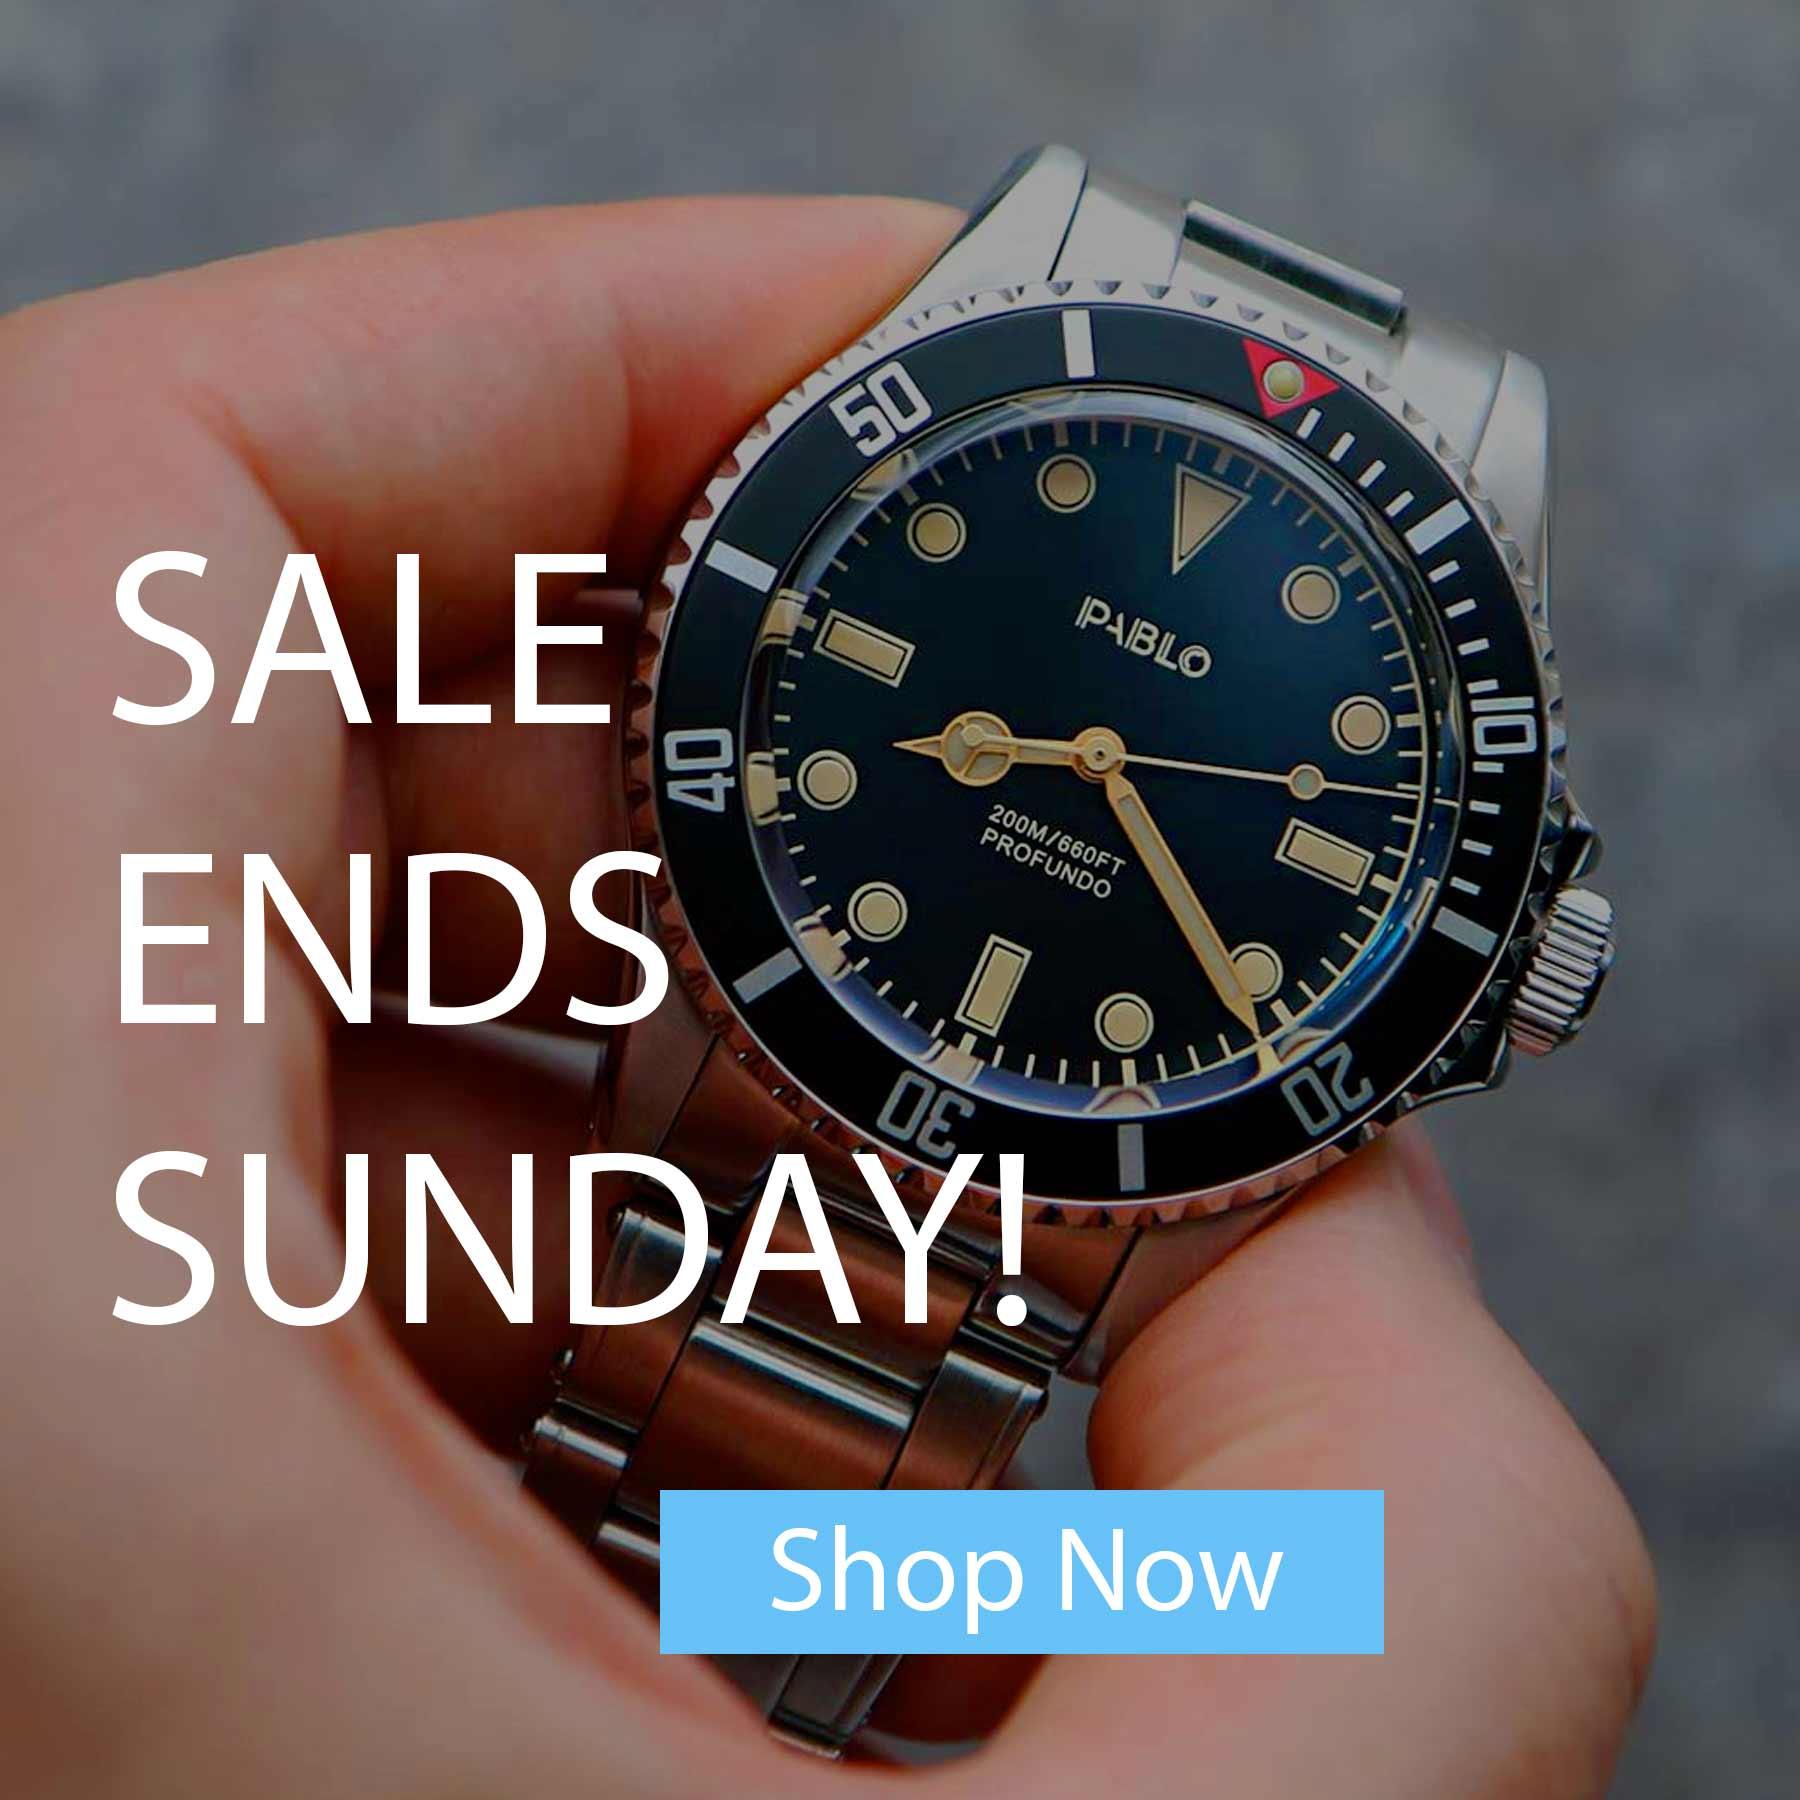 Sale Ends Sunday Banner